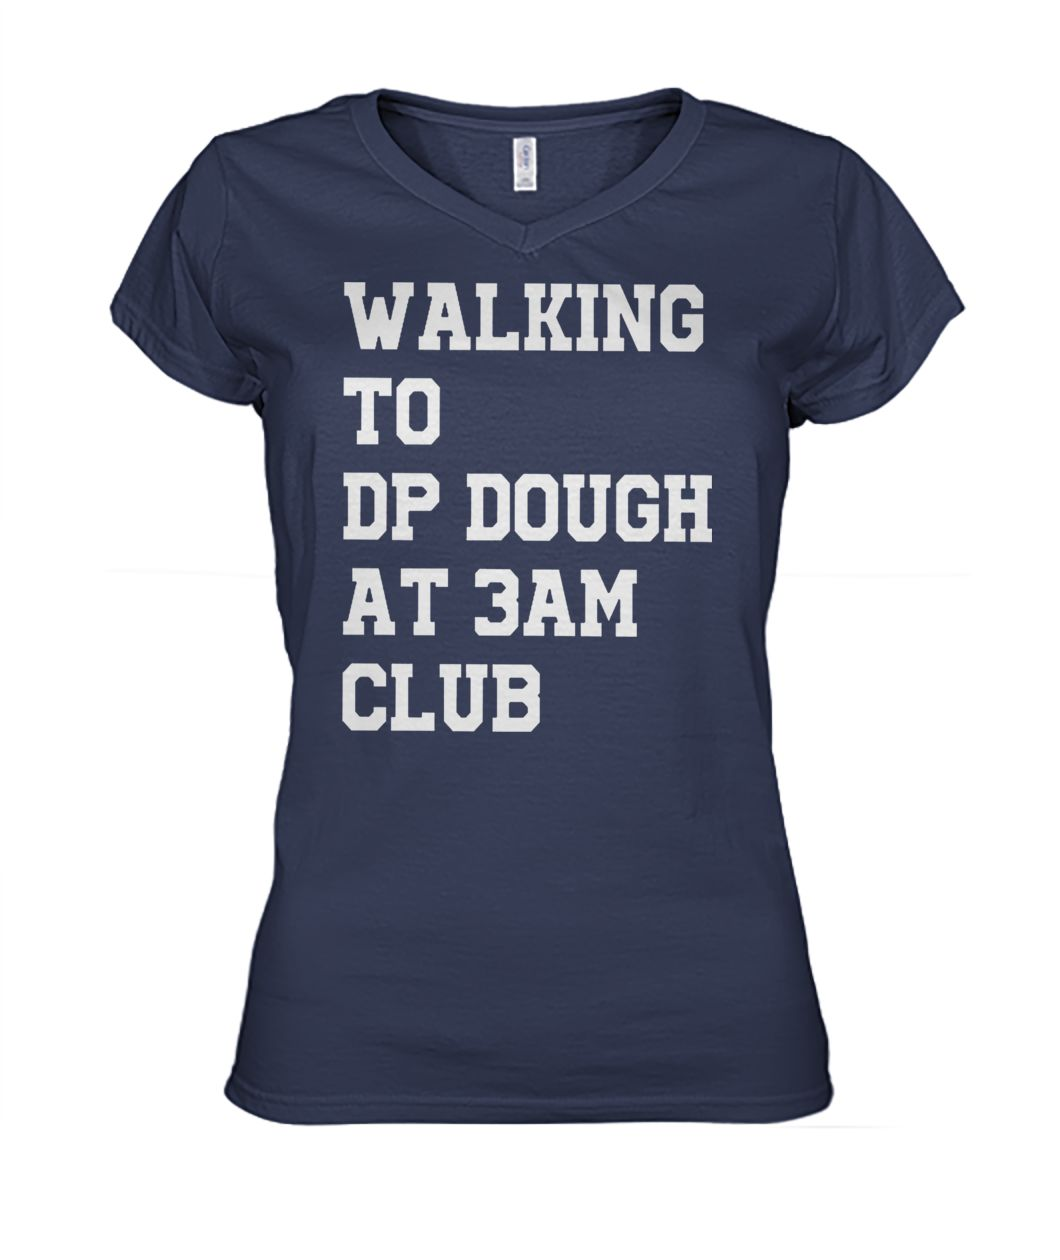 [Hot version] Walking to DP dough at 3am club shirt